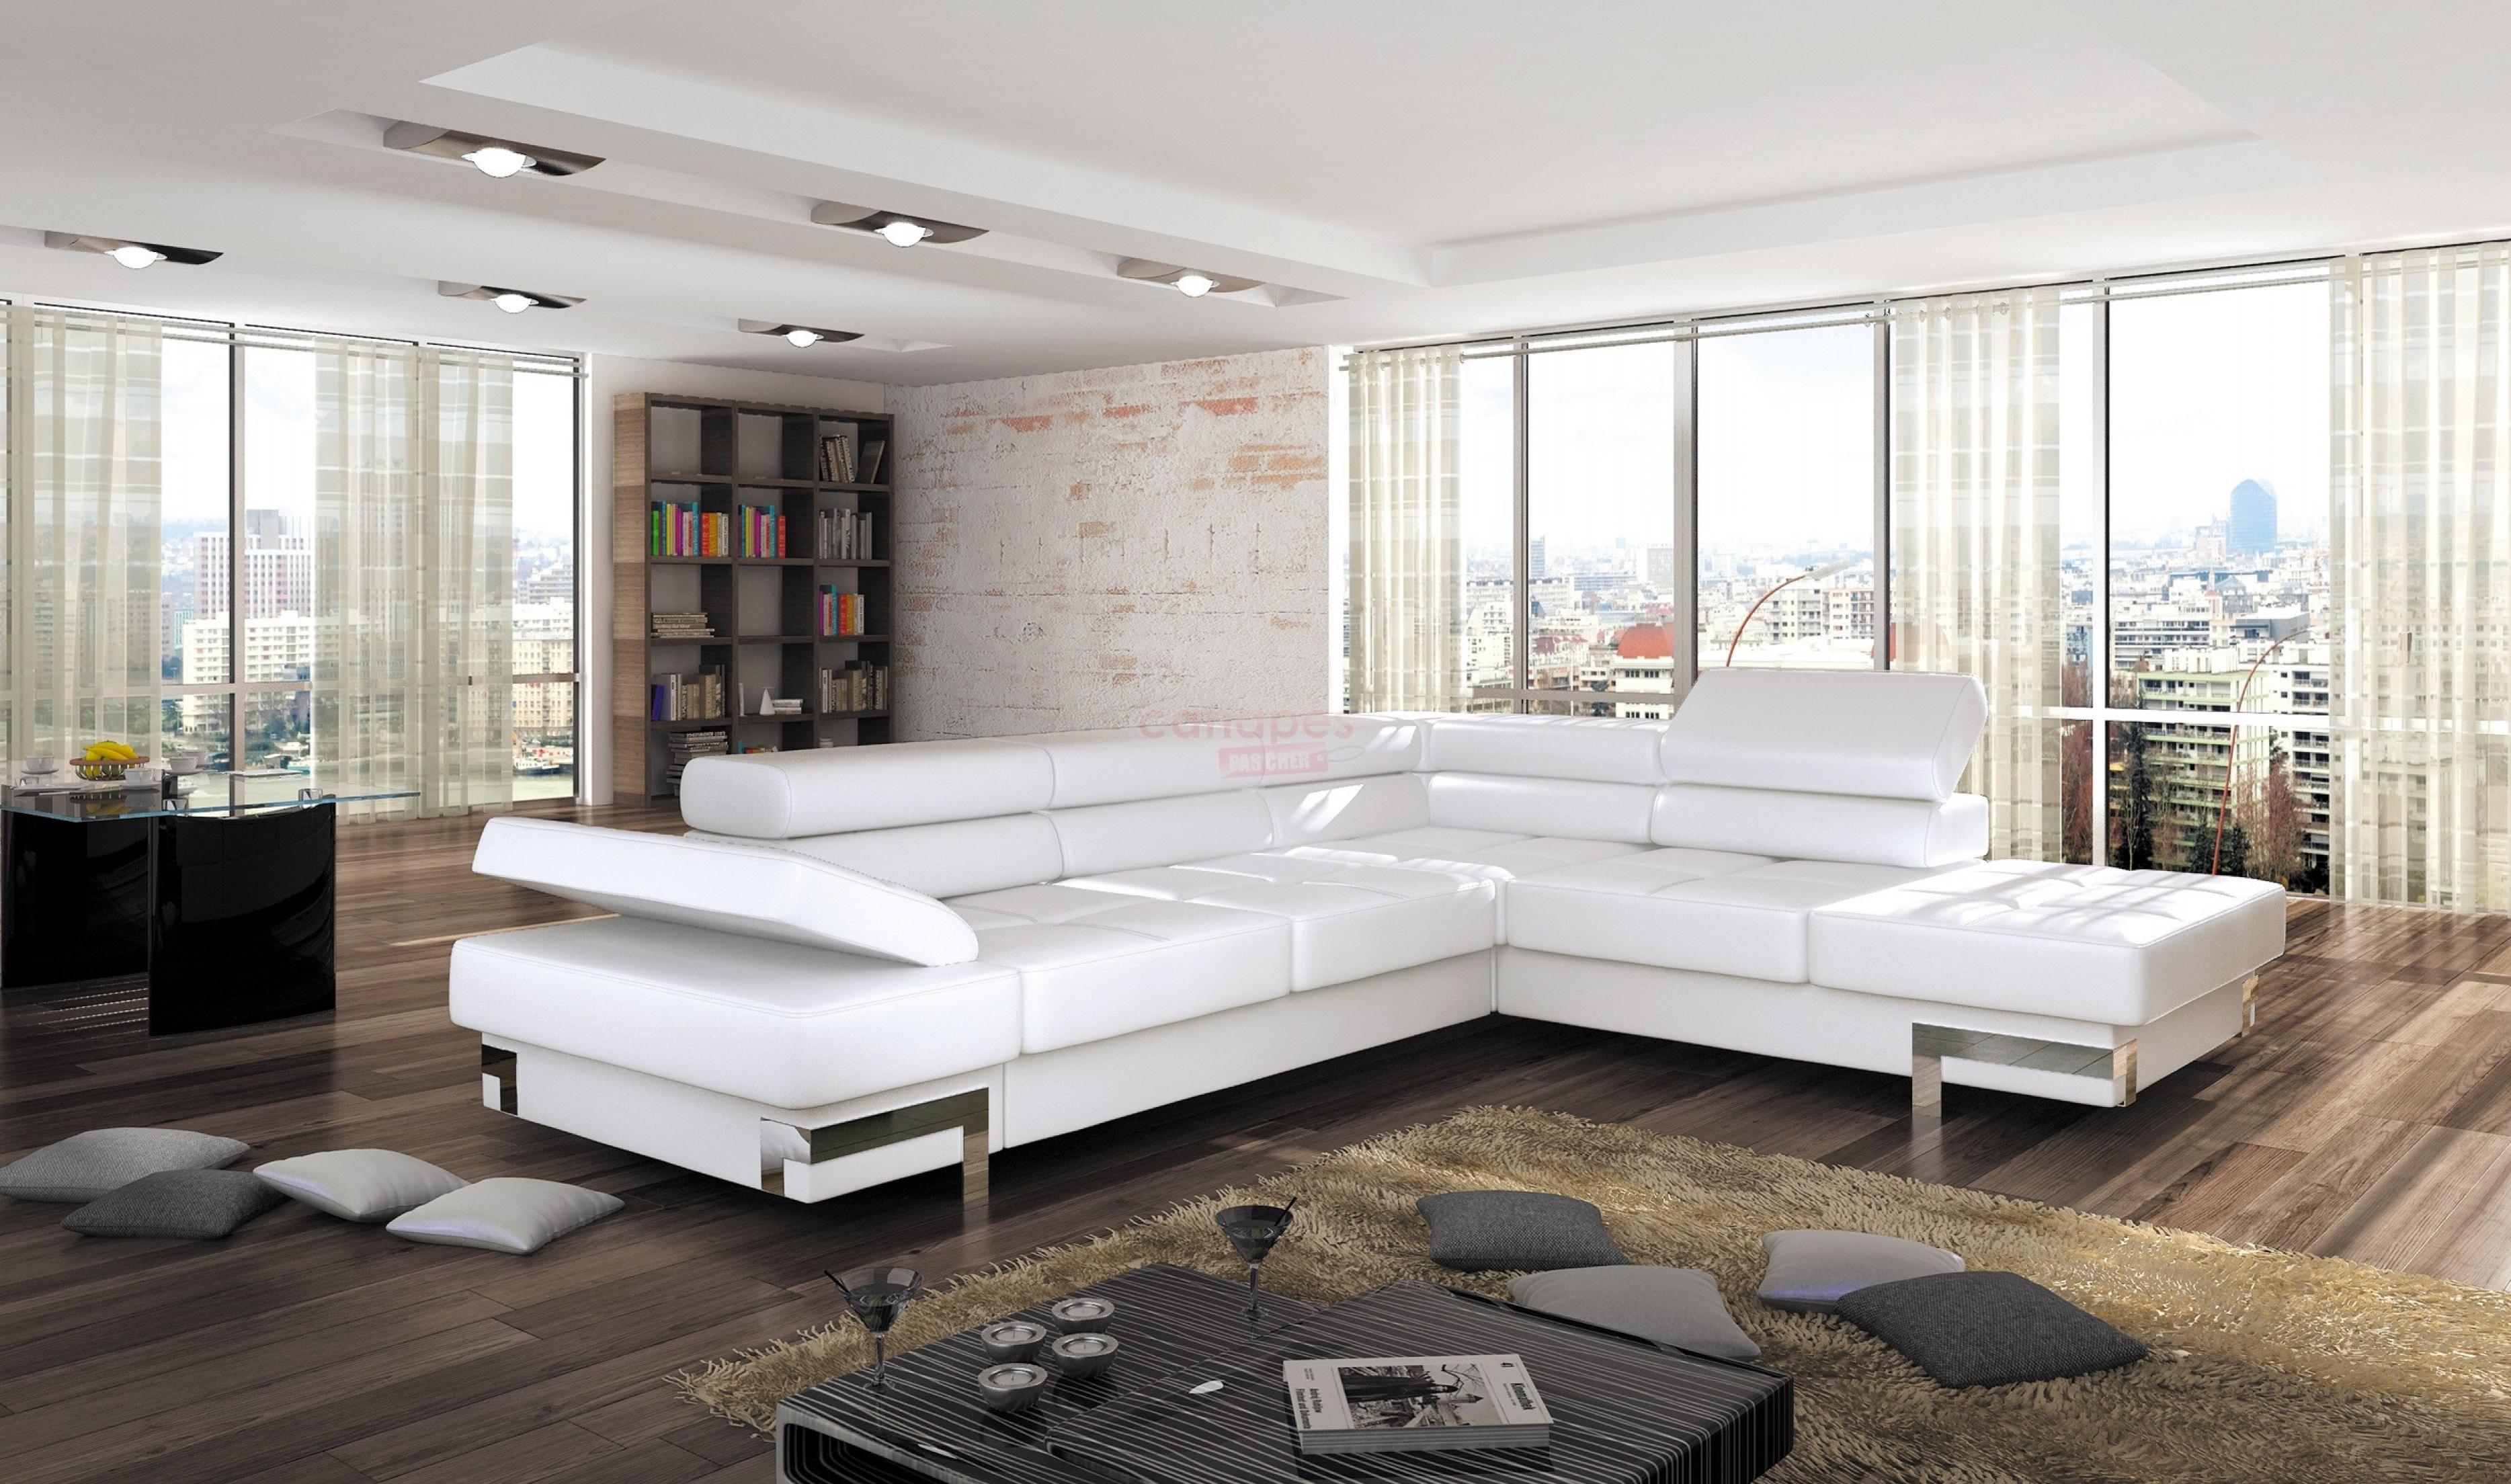 photos canap d 39 angle convertible design pas cher. Black Bedroom Furniture Sets. Home Design Ideas